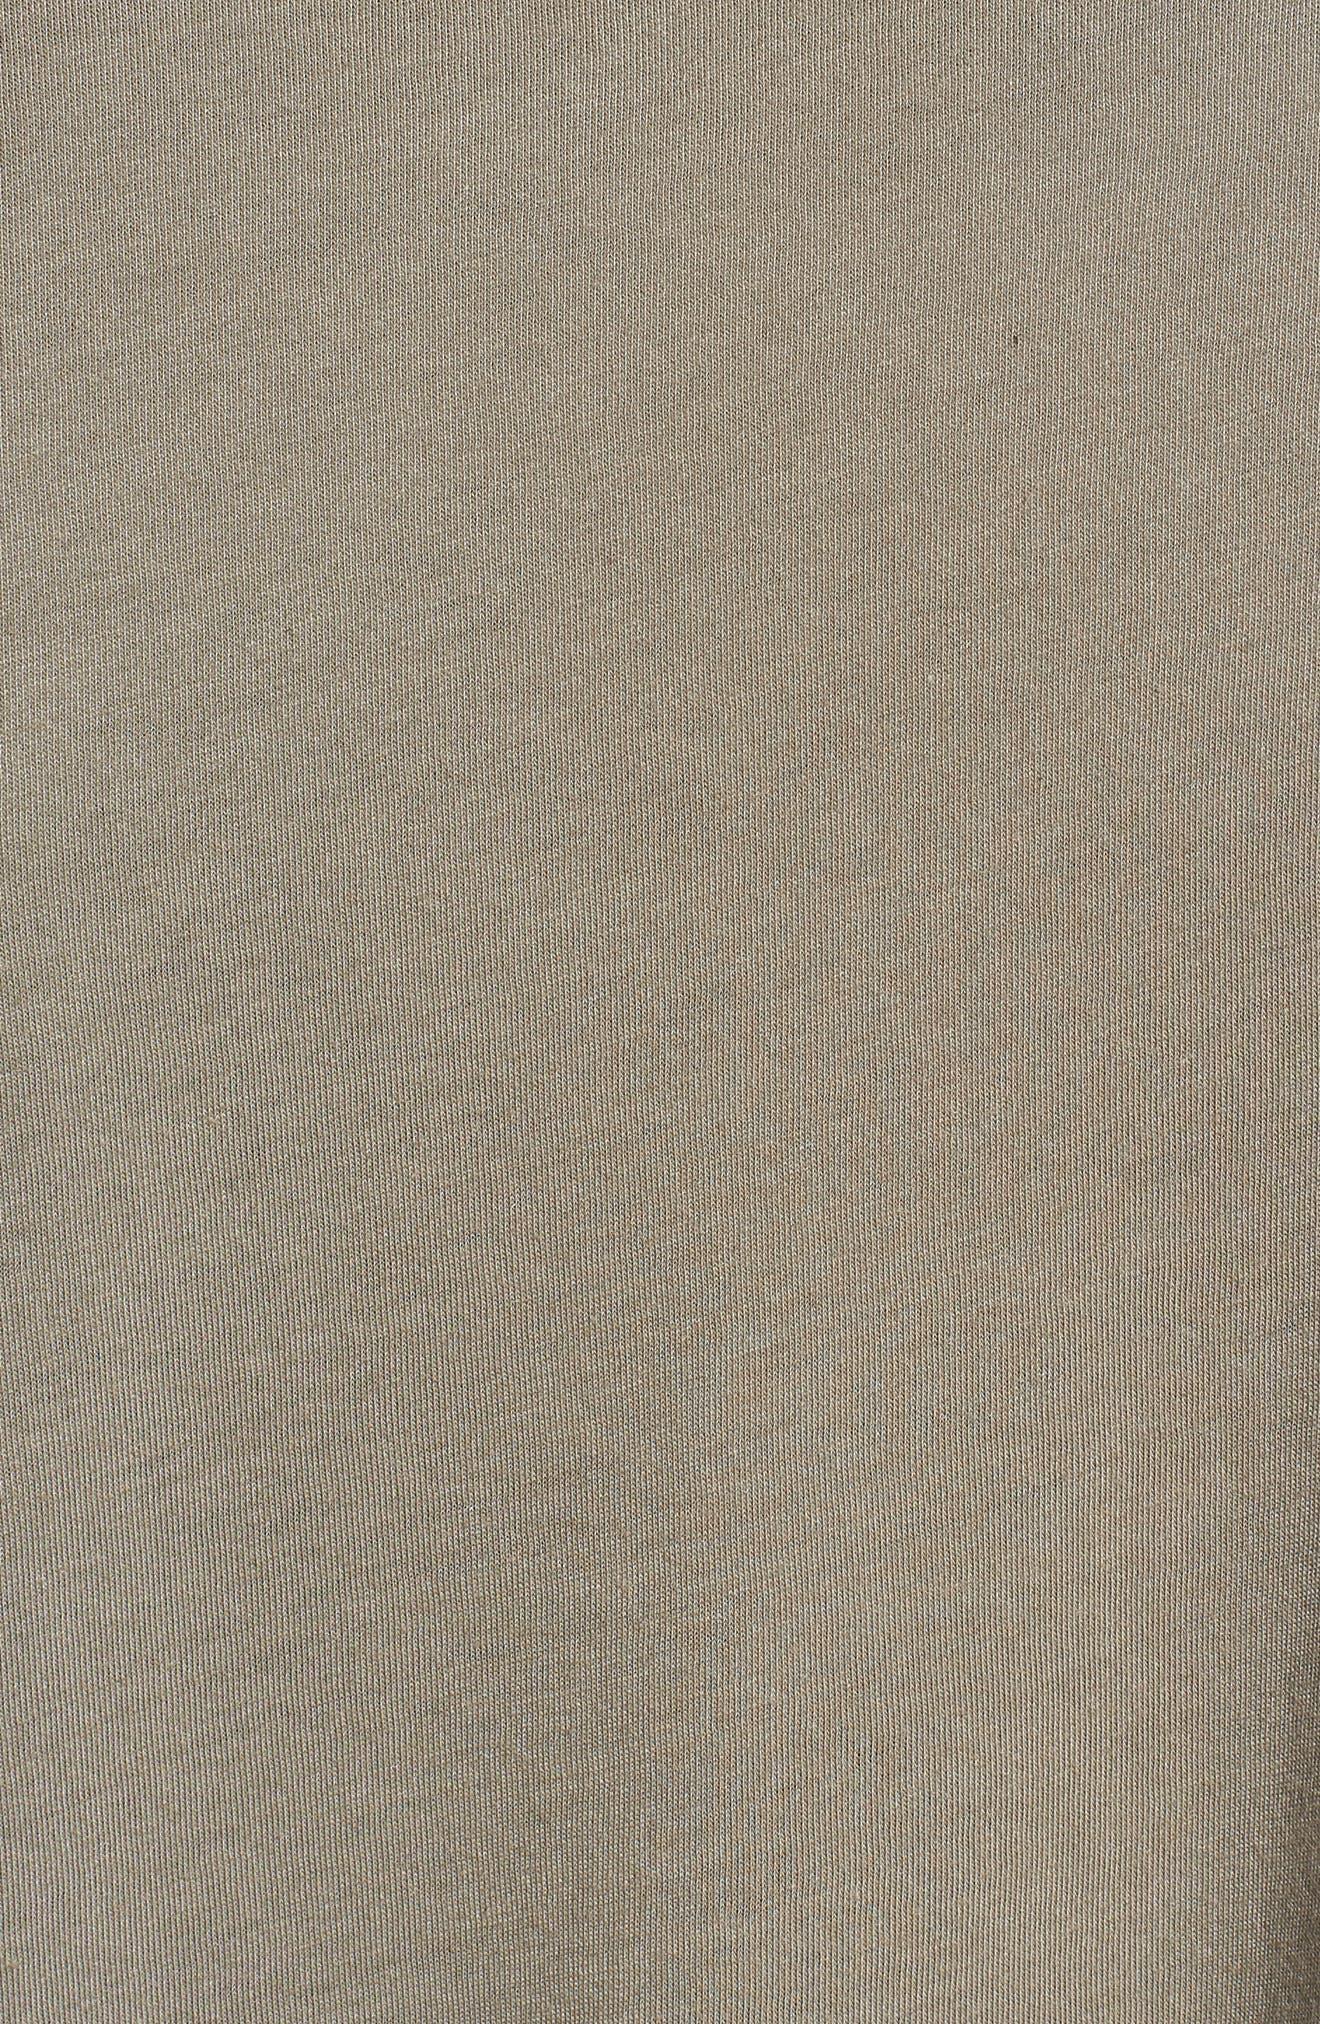 Classic International Crewneck T-Shirt,                             Alternate thumbnail 5, color,                             001